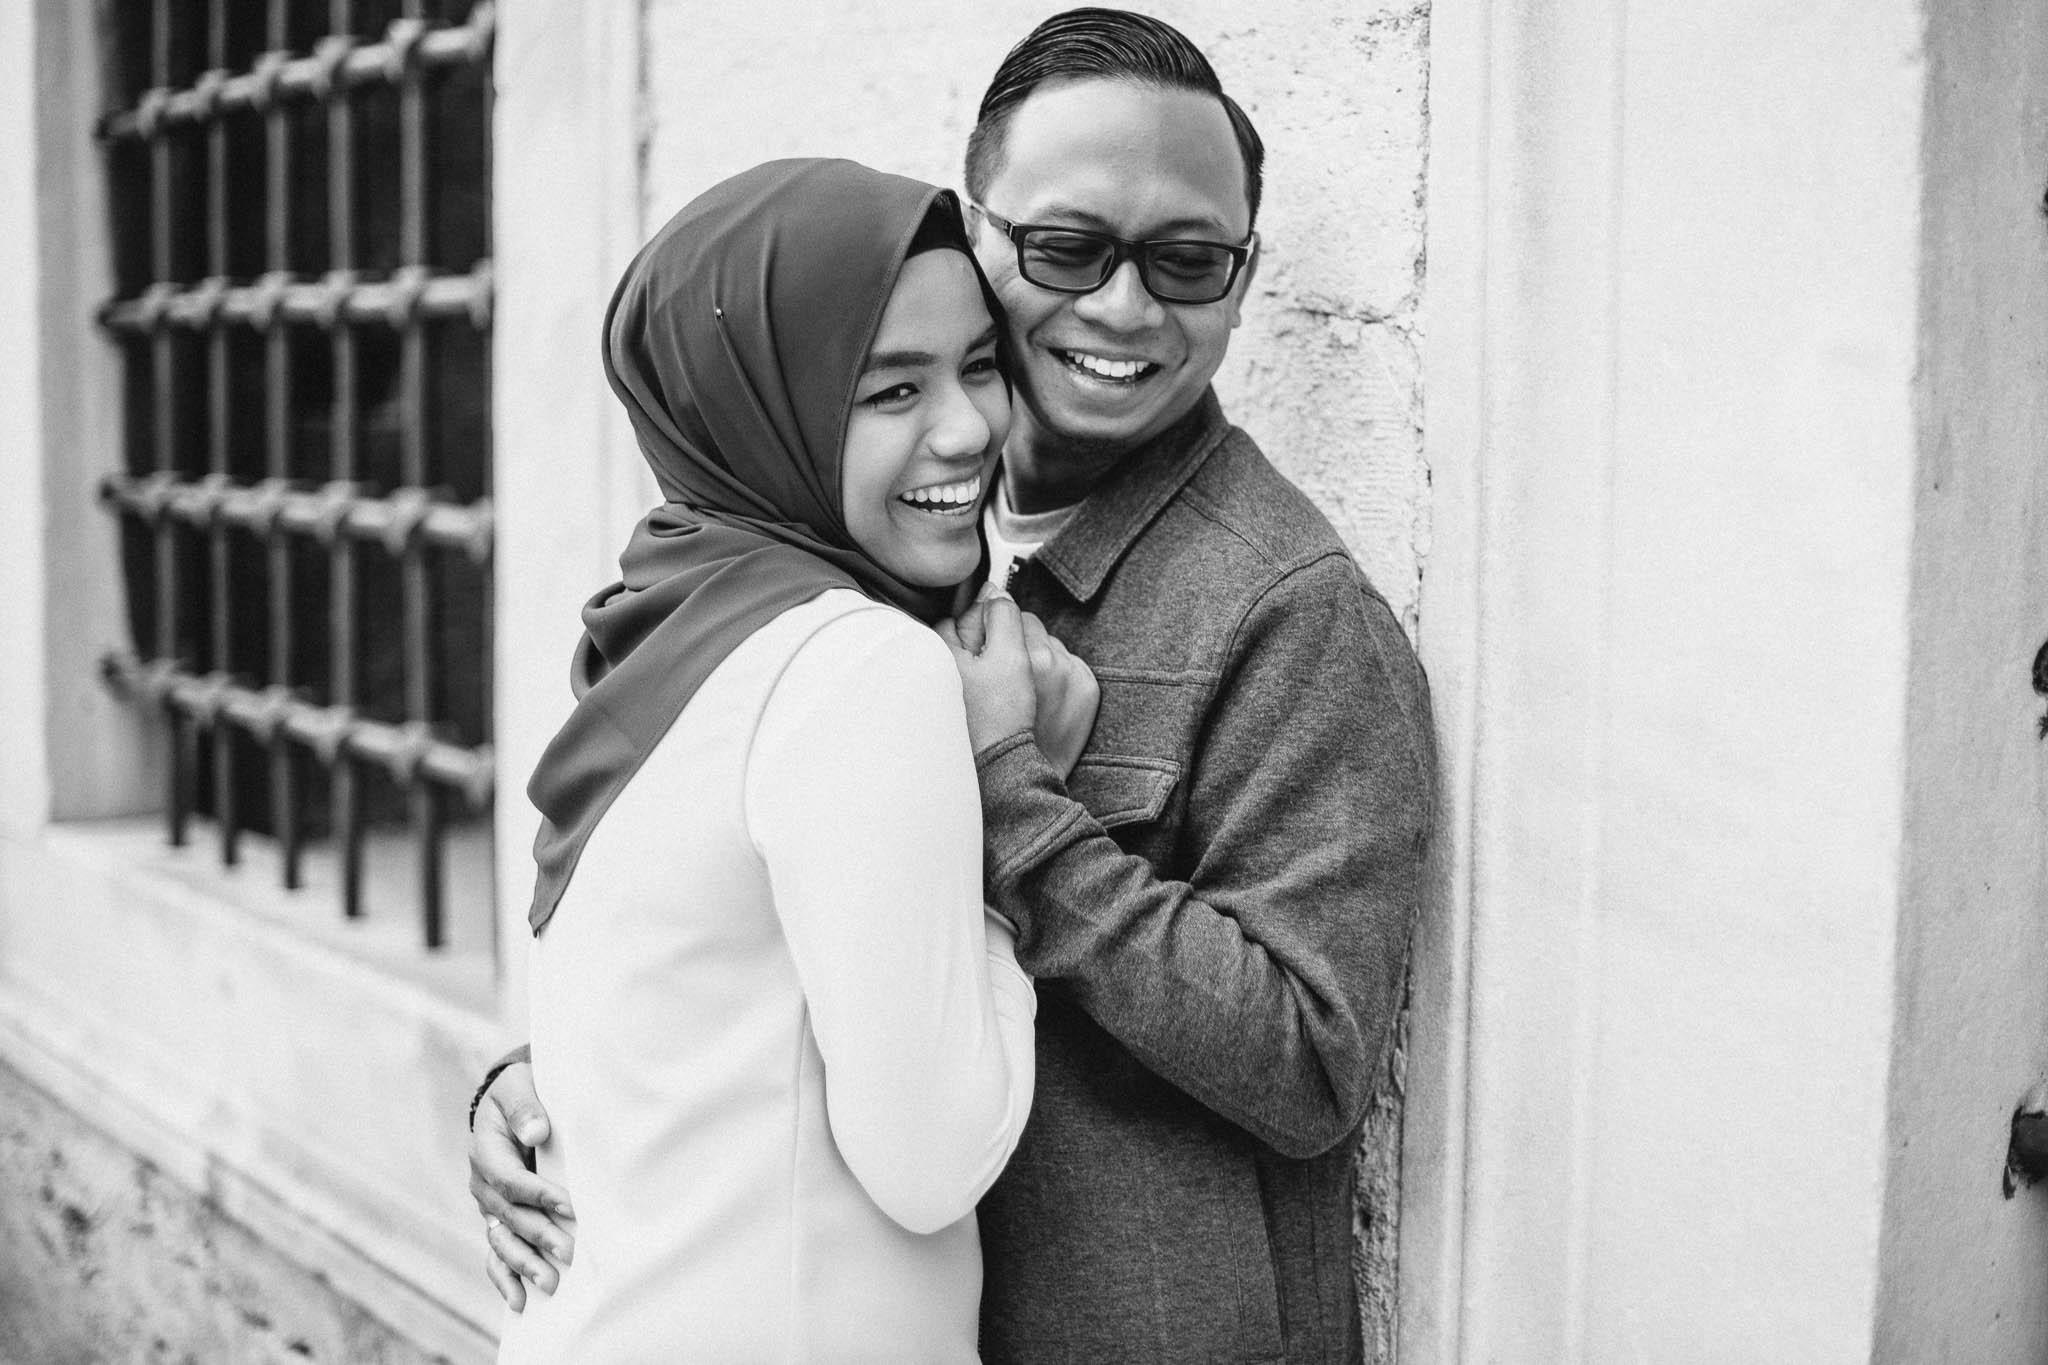 singapore-wedding-photographer-dzul-isma-istanbul-wmt-15.jpg